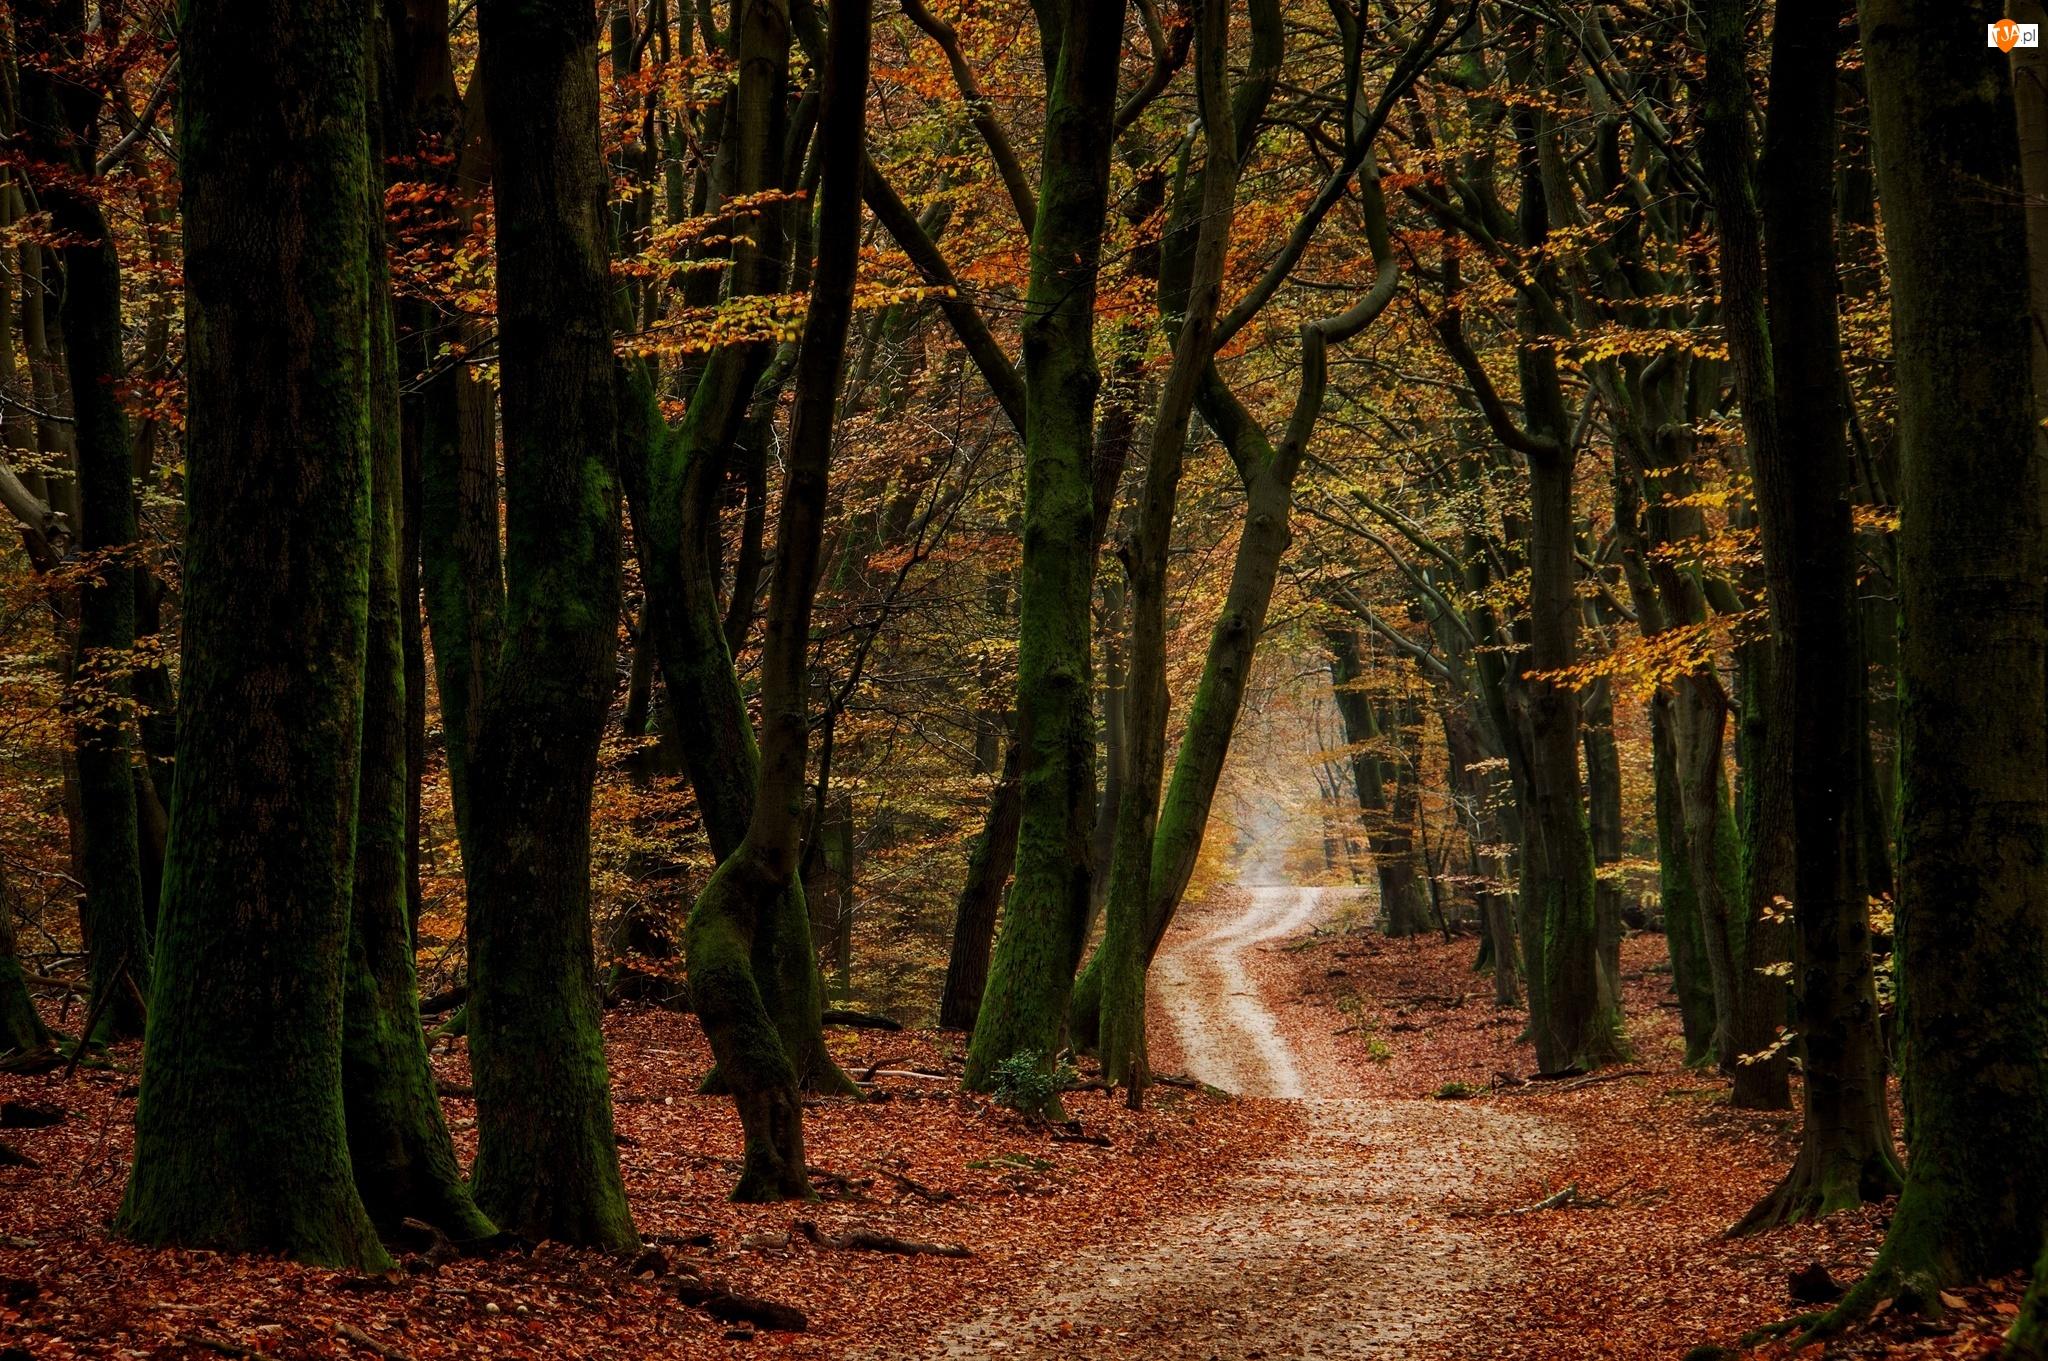 Jesień, Liście, Droga, Las